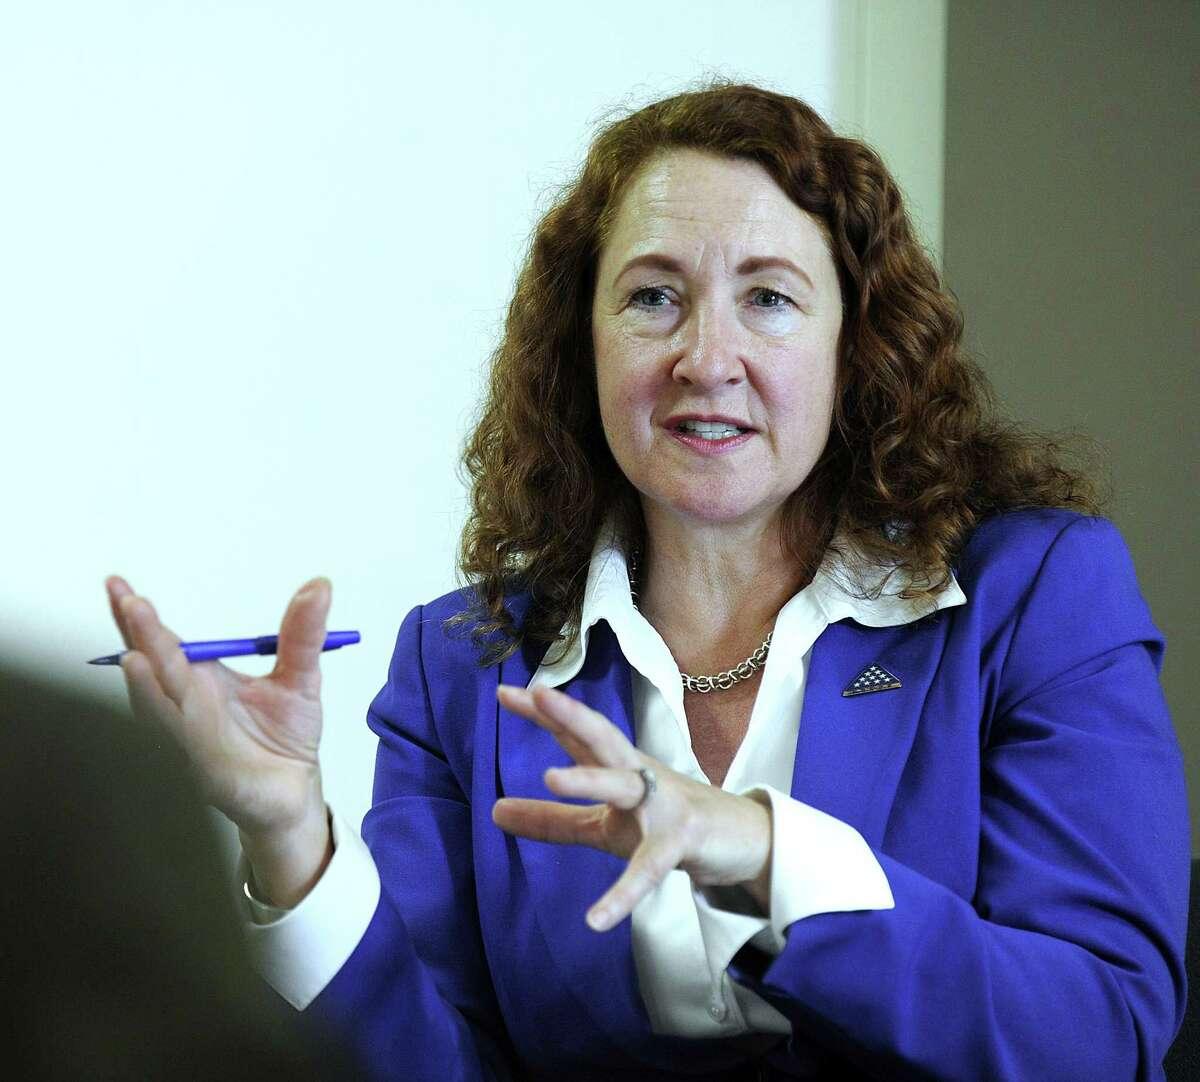 File photo of U.S. Rep. Elizabeth Esty, D- 5th.